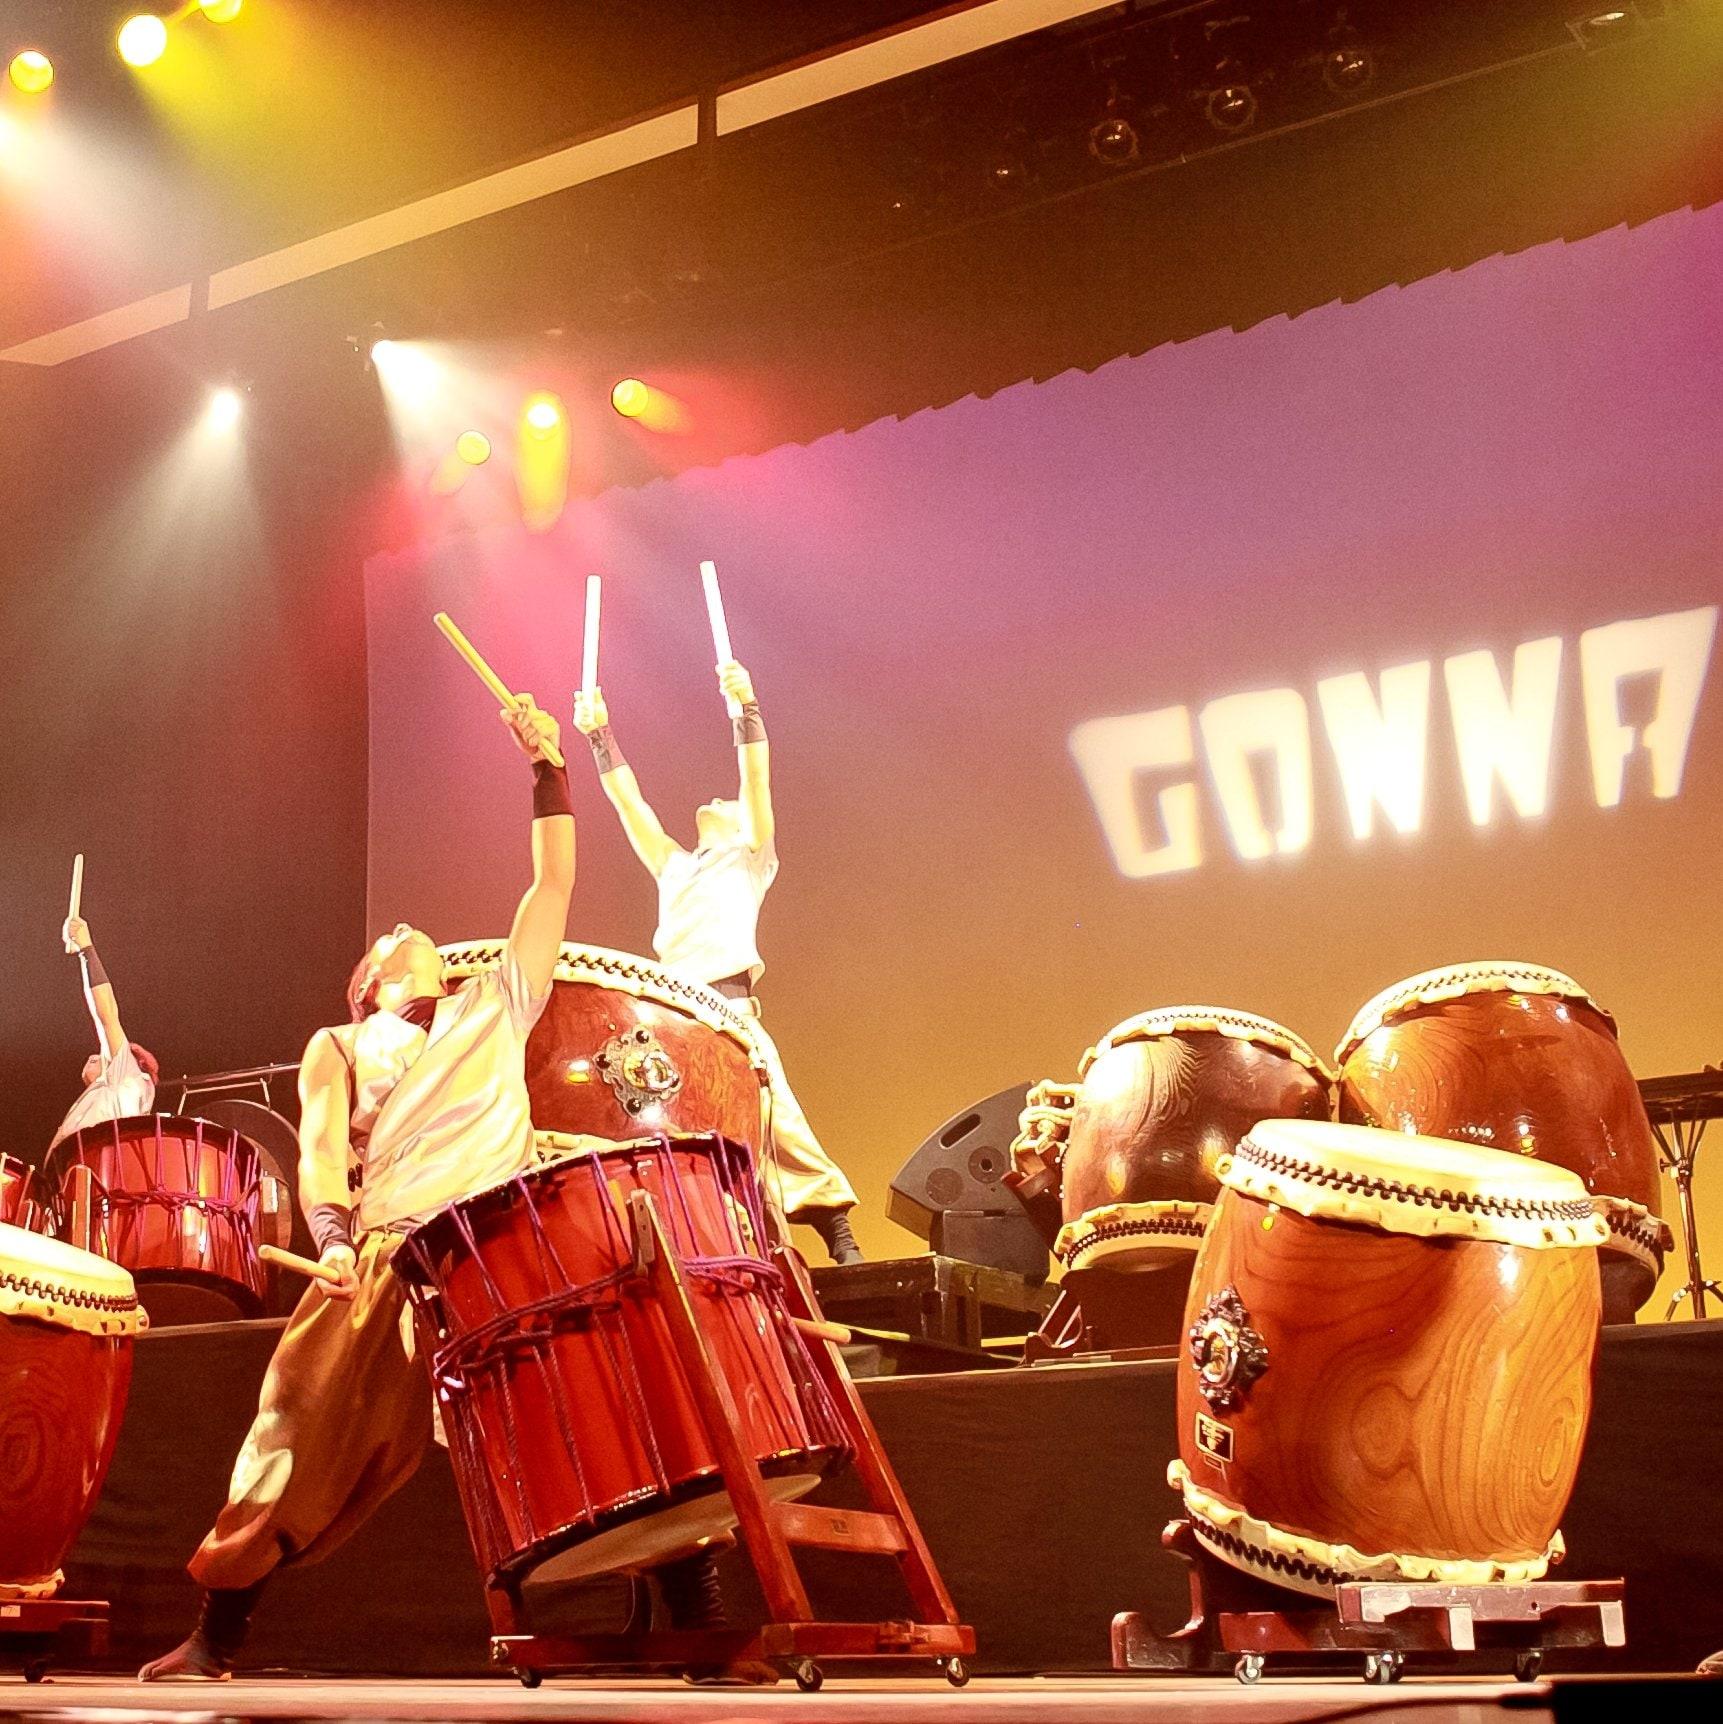 GONNA(ガナ)|JOY|盆太鼓とJazzの融合